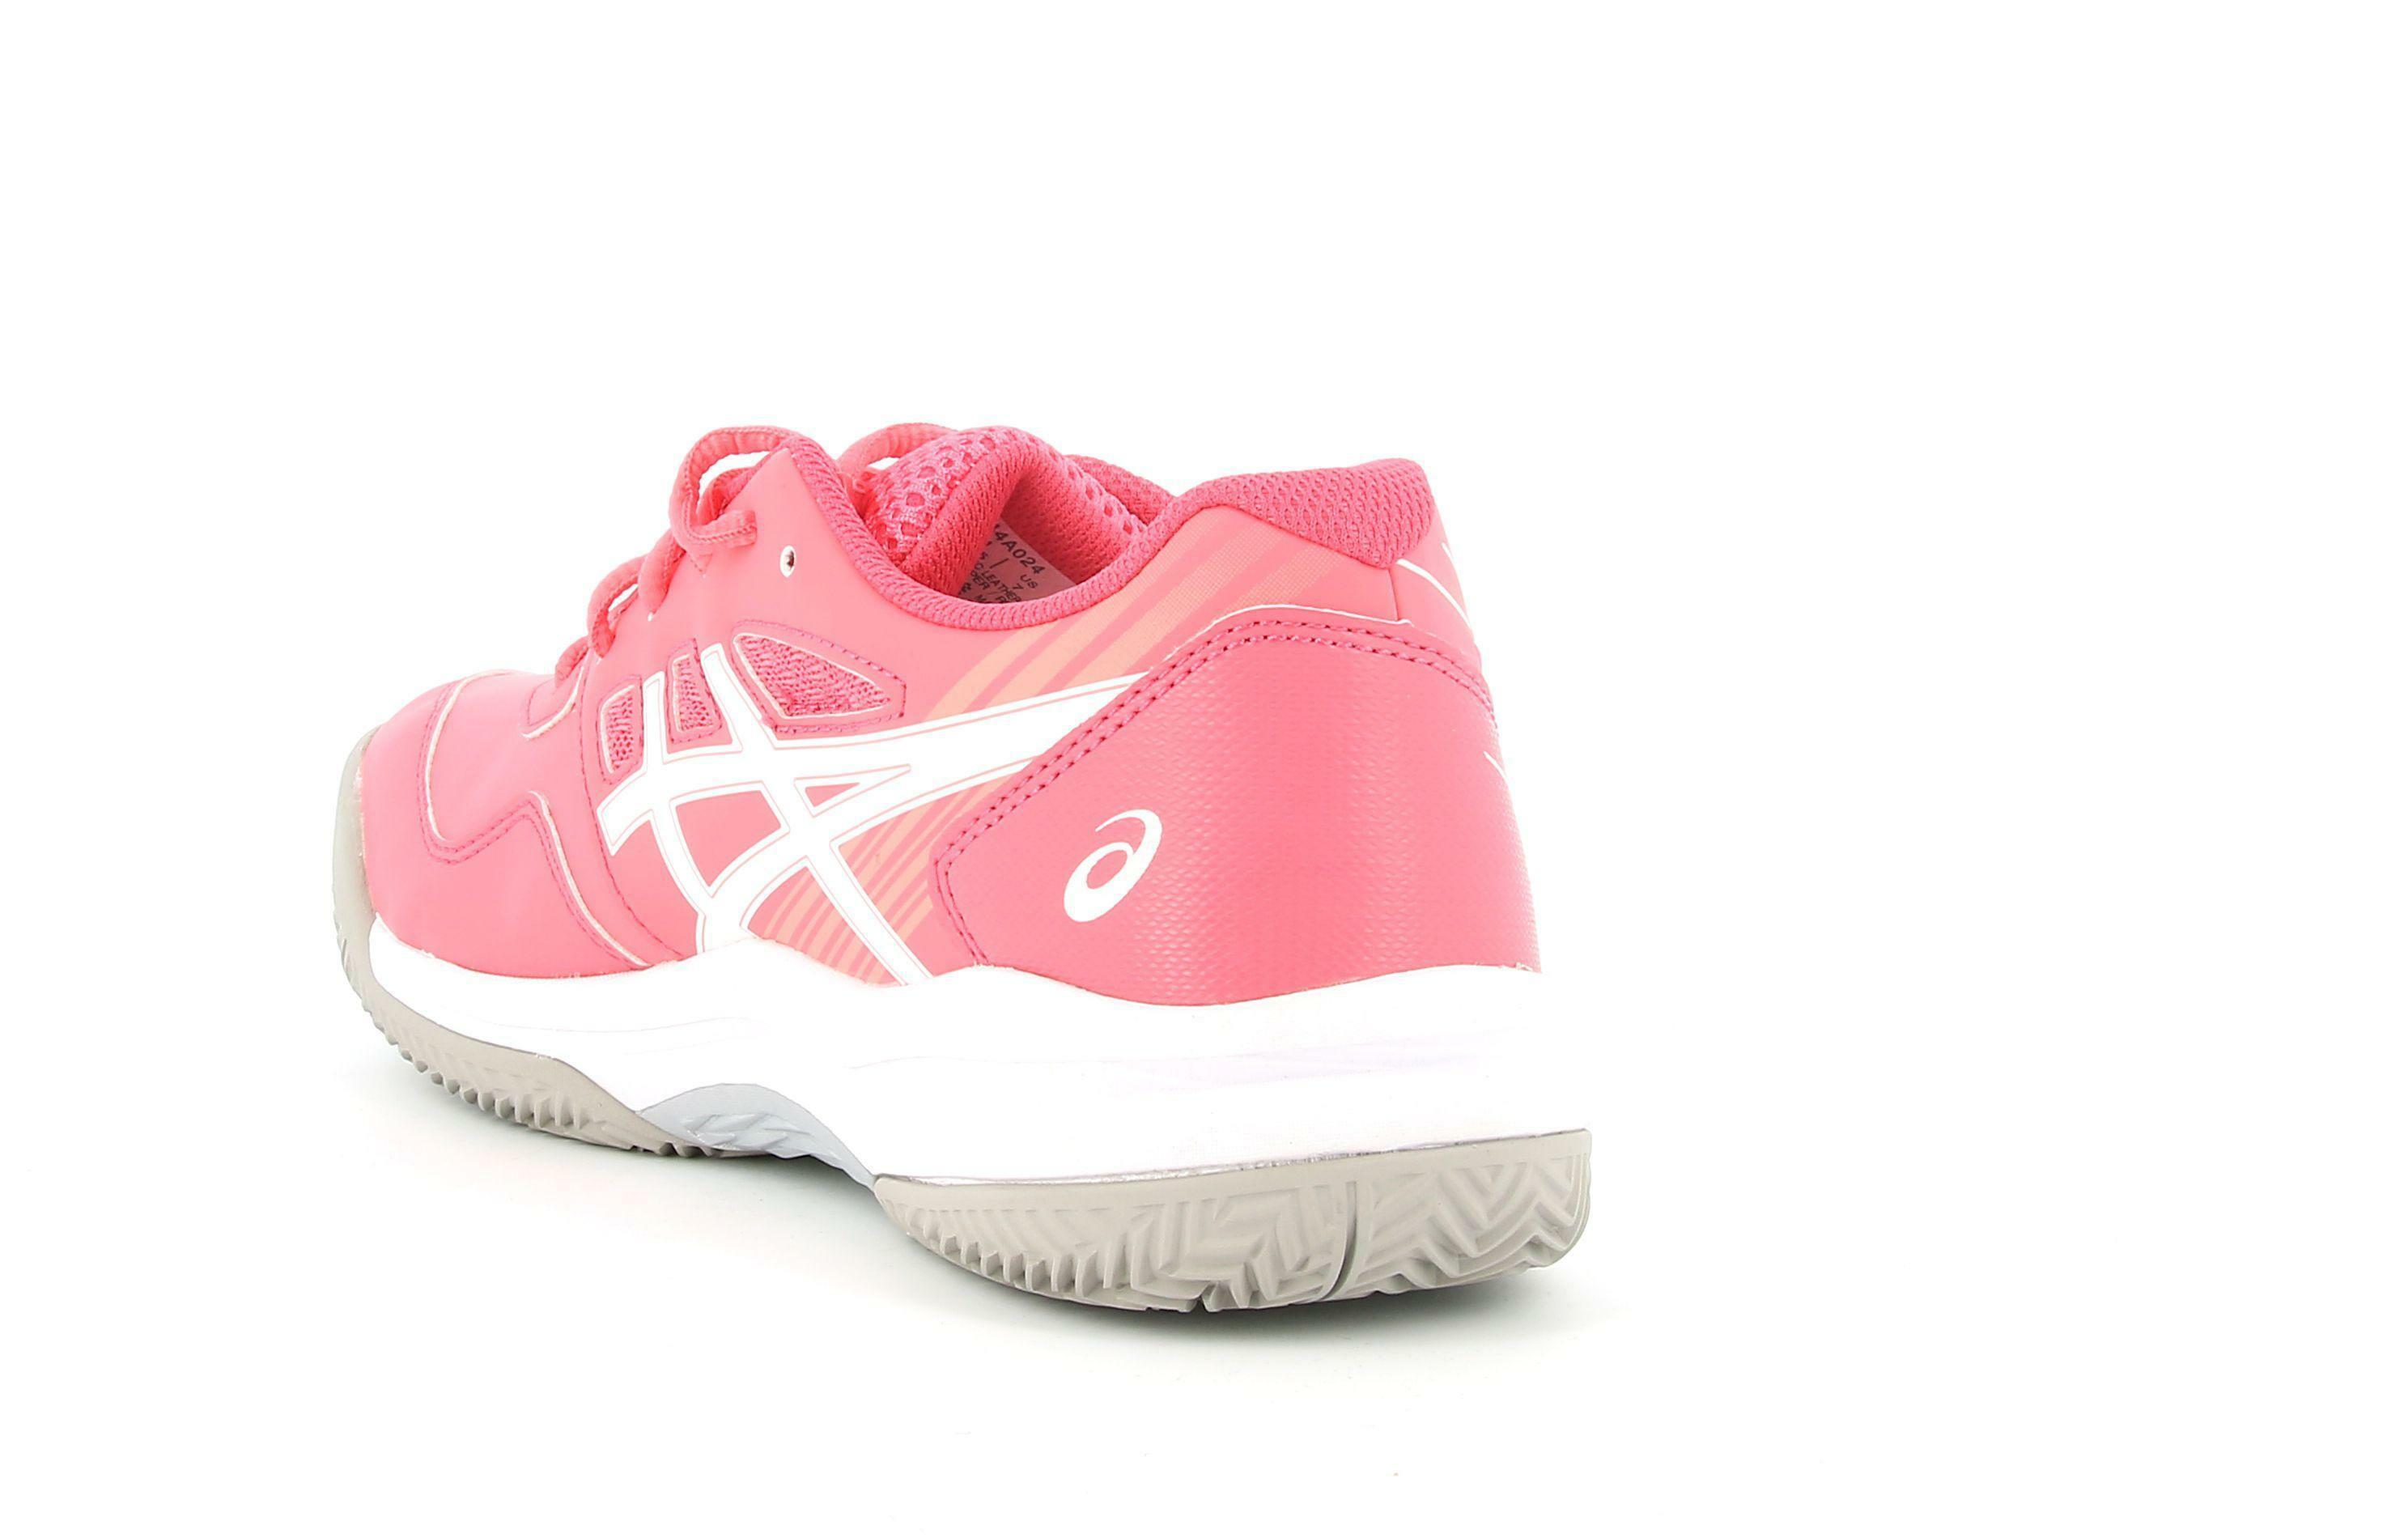 asics asics gel game 8 clay/oc gs 1044a024 scarpa sportiva tennis da donna rosa